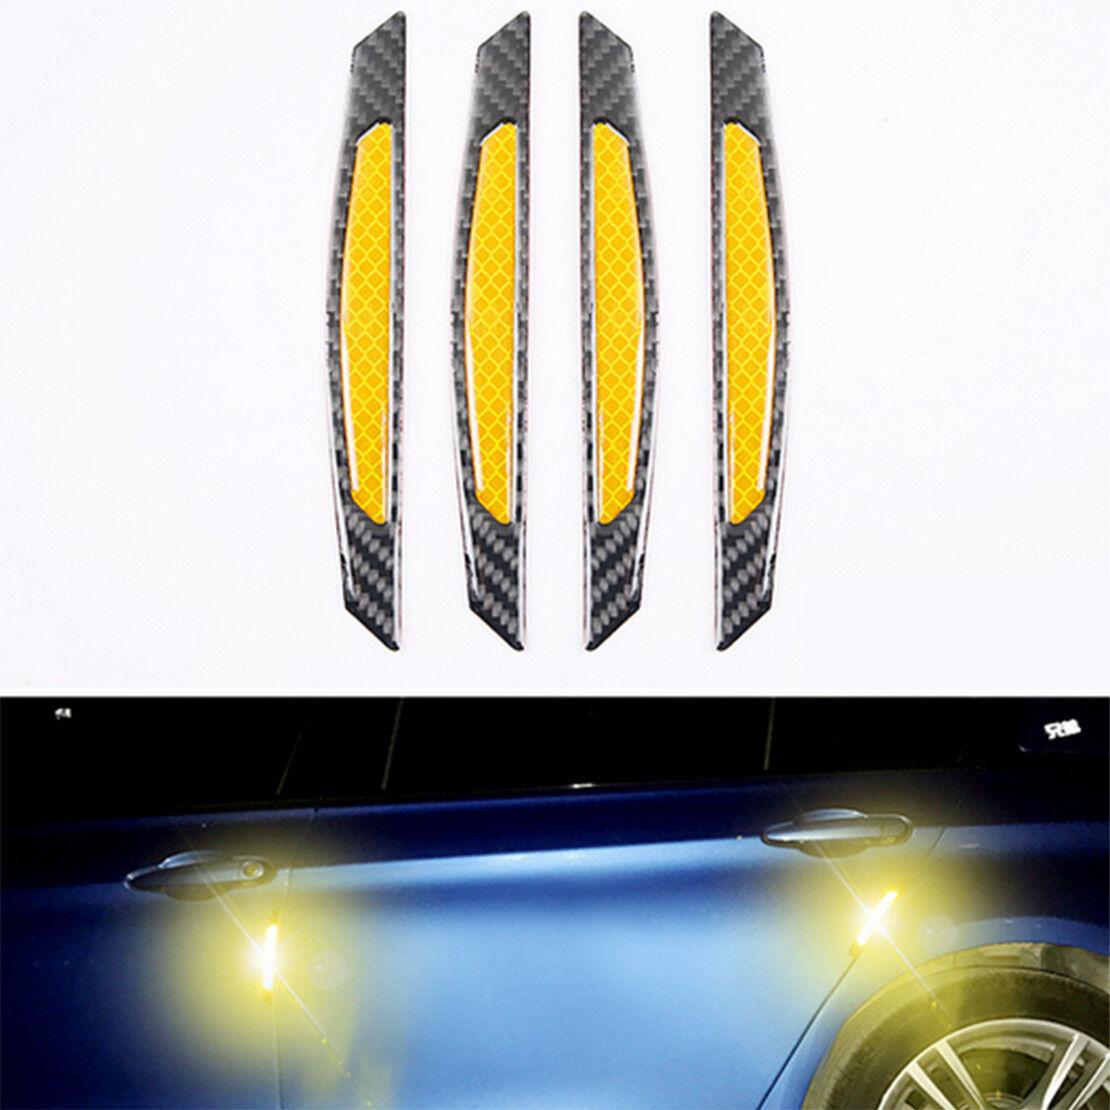 4x White Reflective Carbon Fiber Car Door Edge Protector anti-collision Sticker